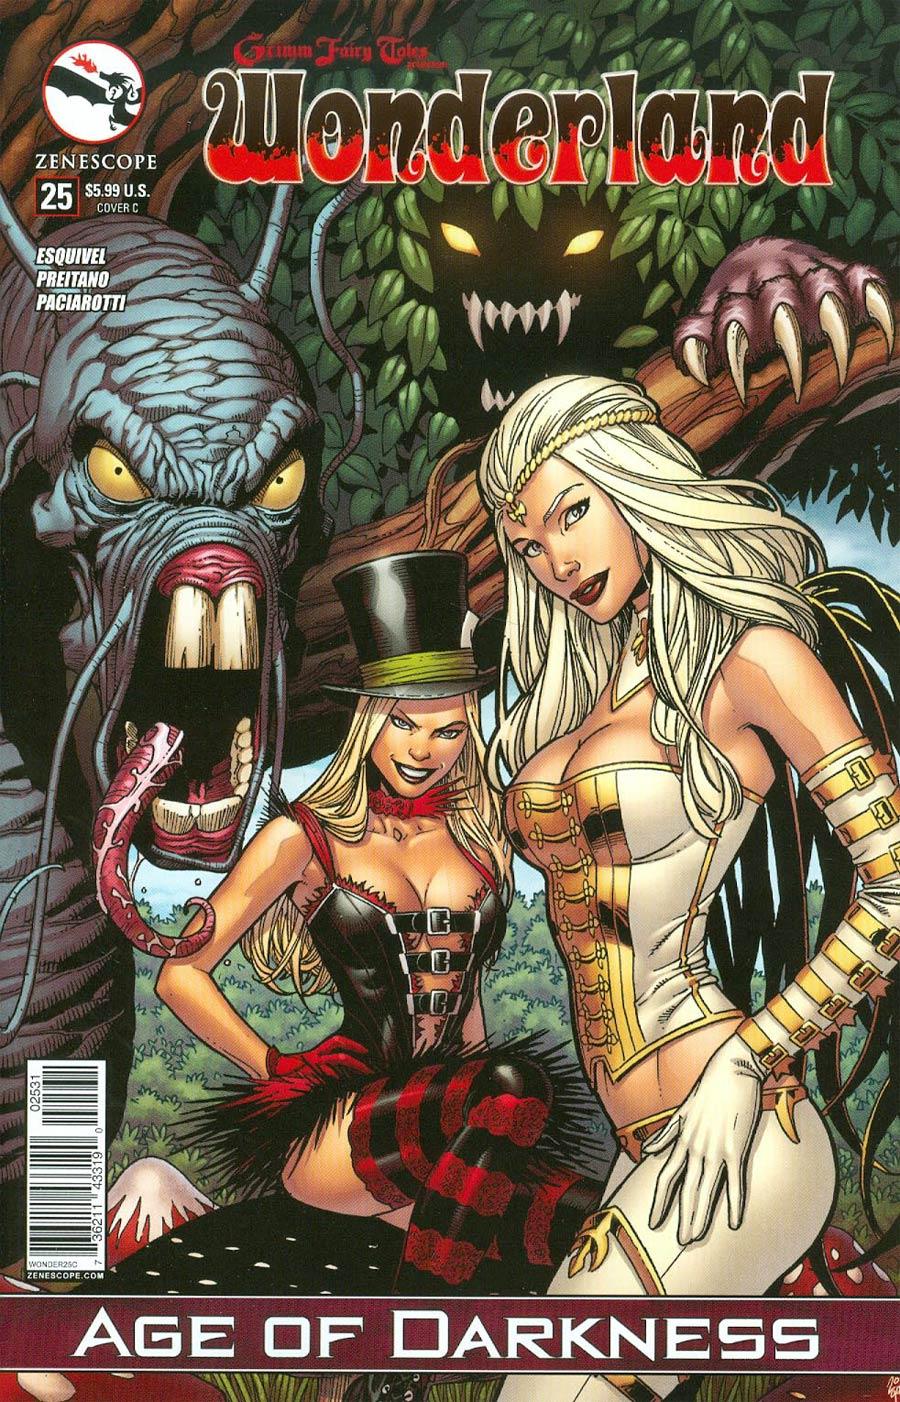 Grimm Fairy Tales Presents Wonderland Vol 2 #25 Cover C Sean Chen